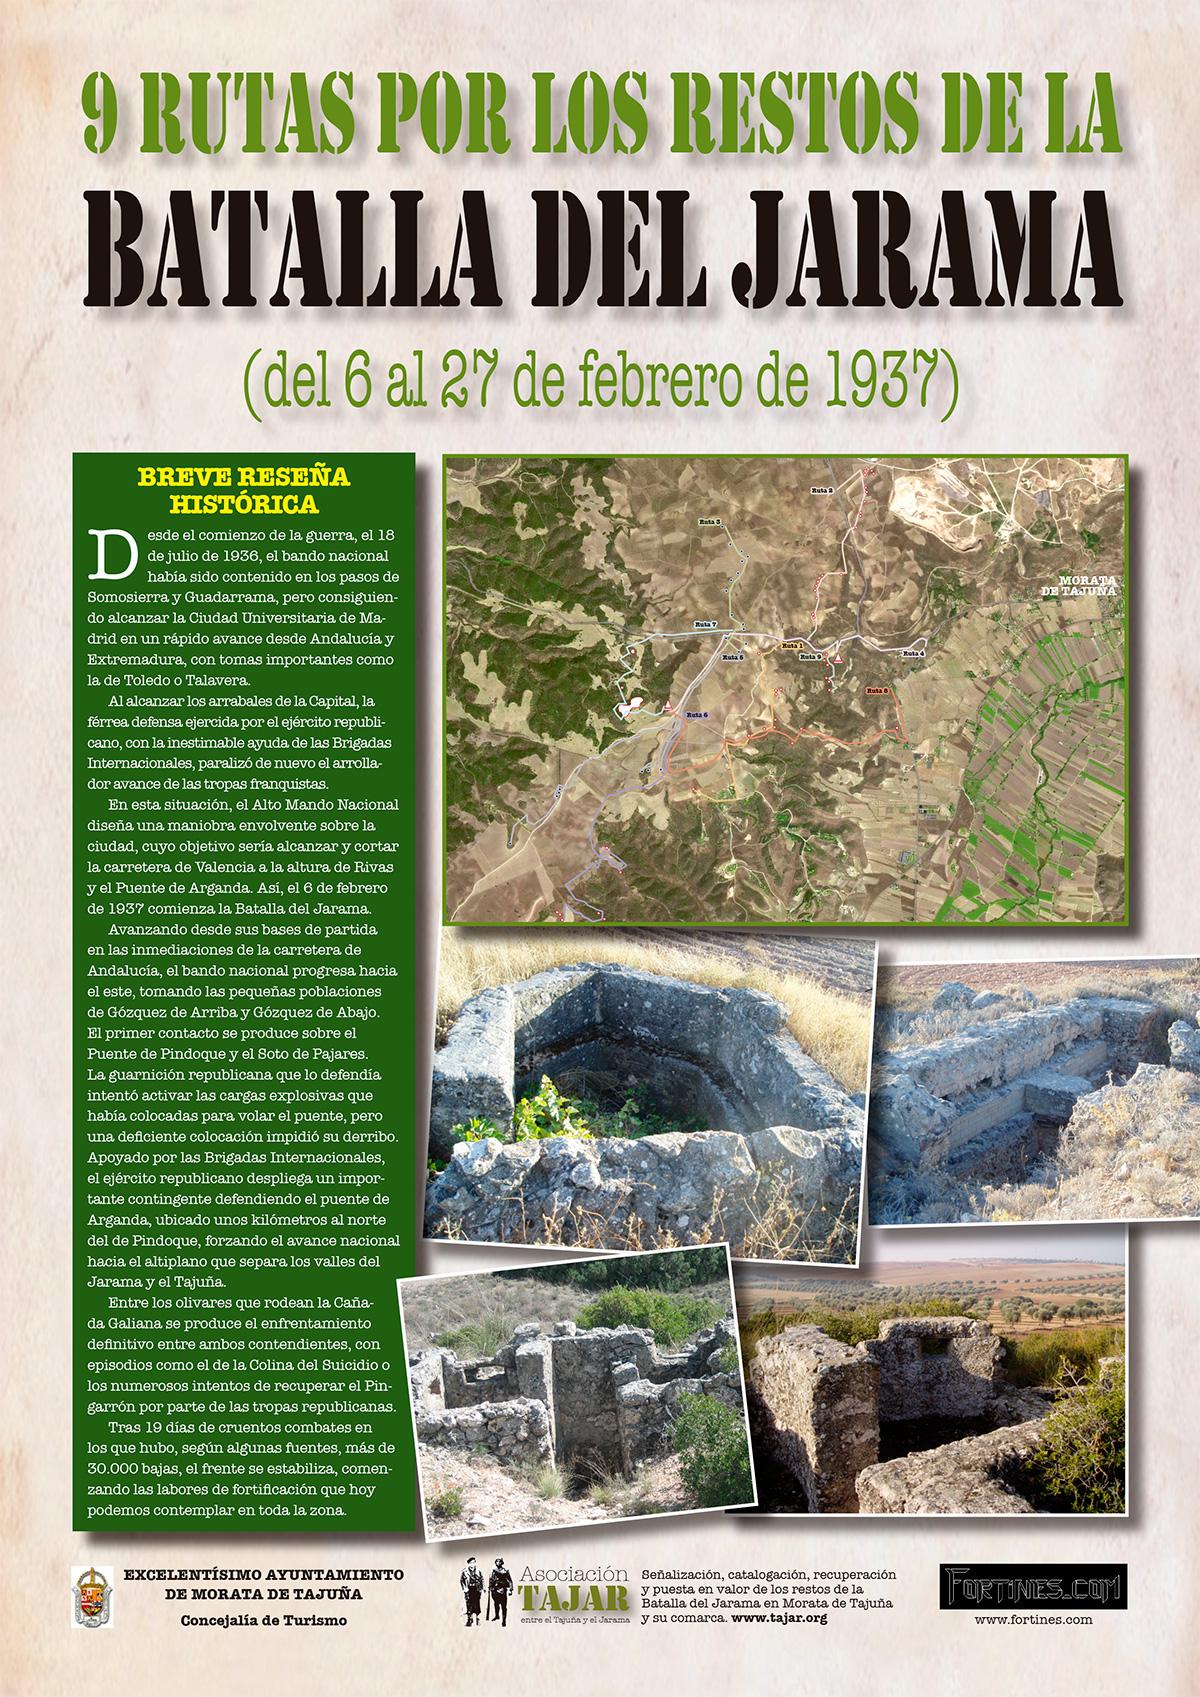 Rutas-Restos-Batalla-Jarama-1-Morata